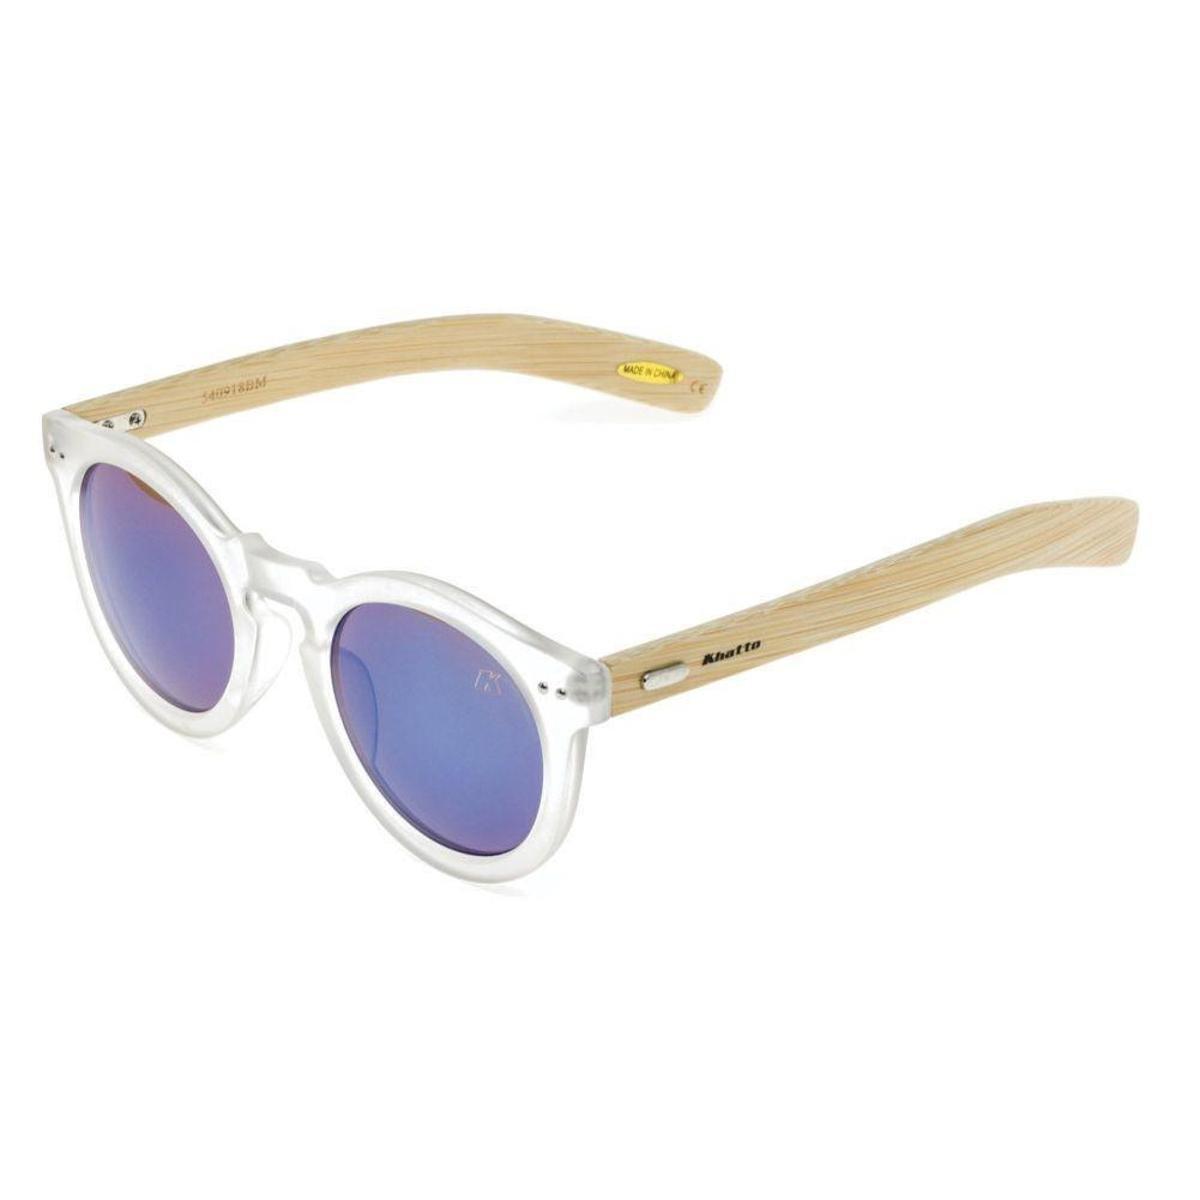 Óculos de Sol Khatto Round Bamboo - Compre Agora   Netshoes da662fe9d4